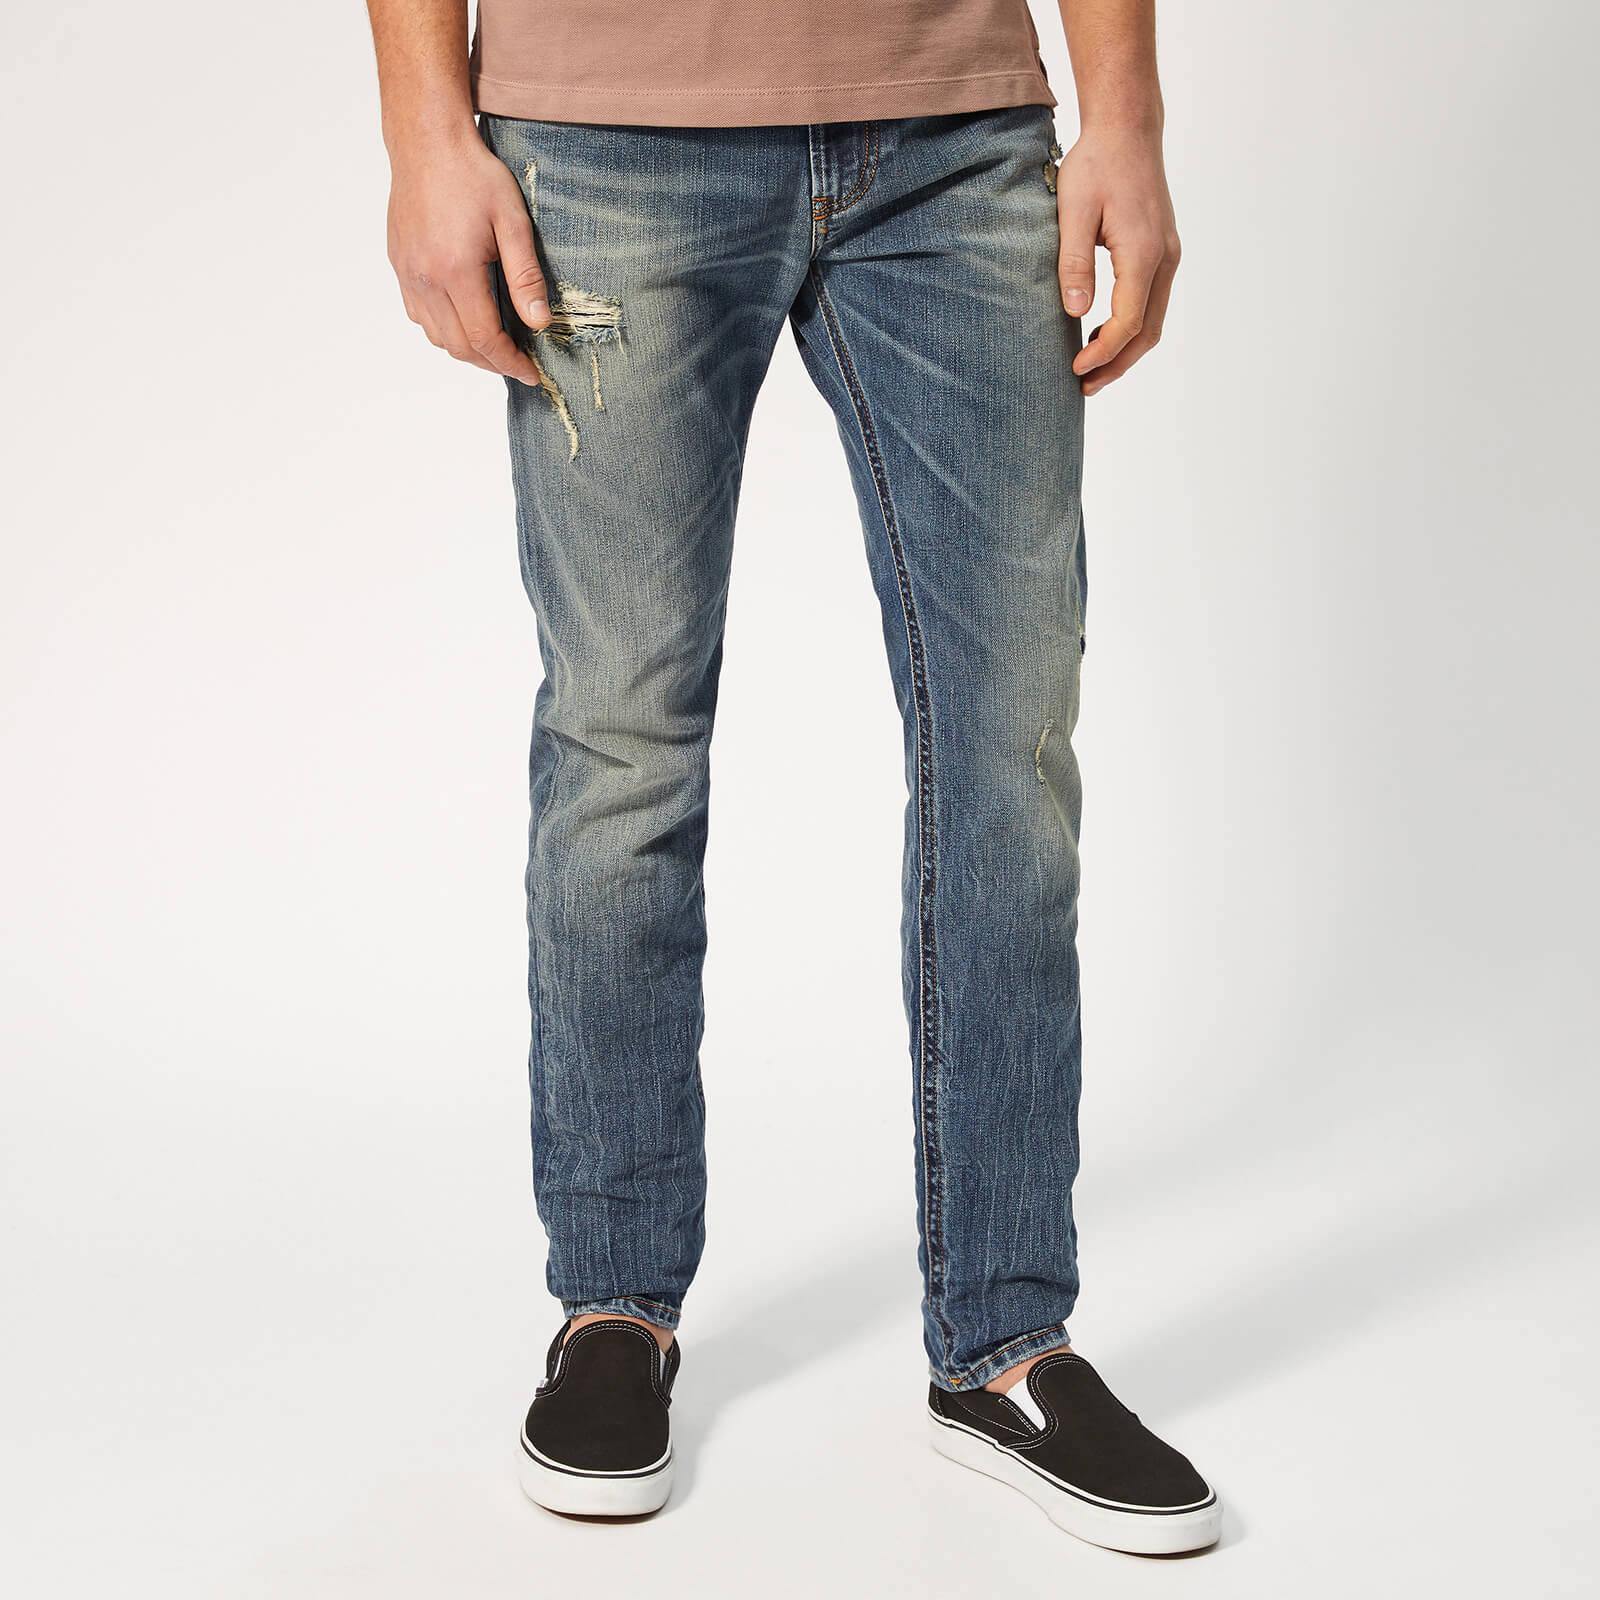 Diesel Men's Thommer Skinny Jeans - Blue - W36/L34 - Blue